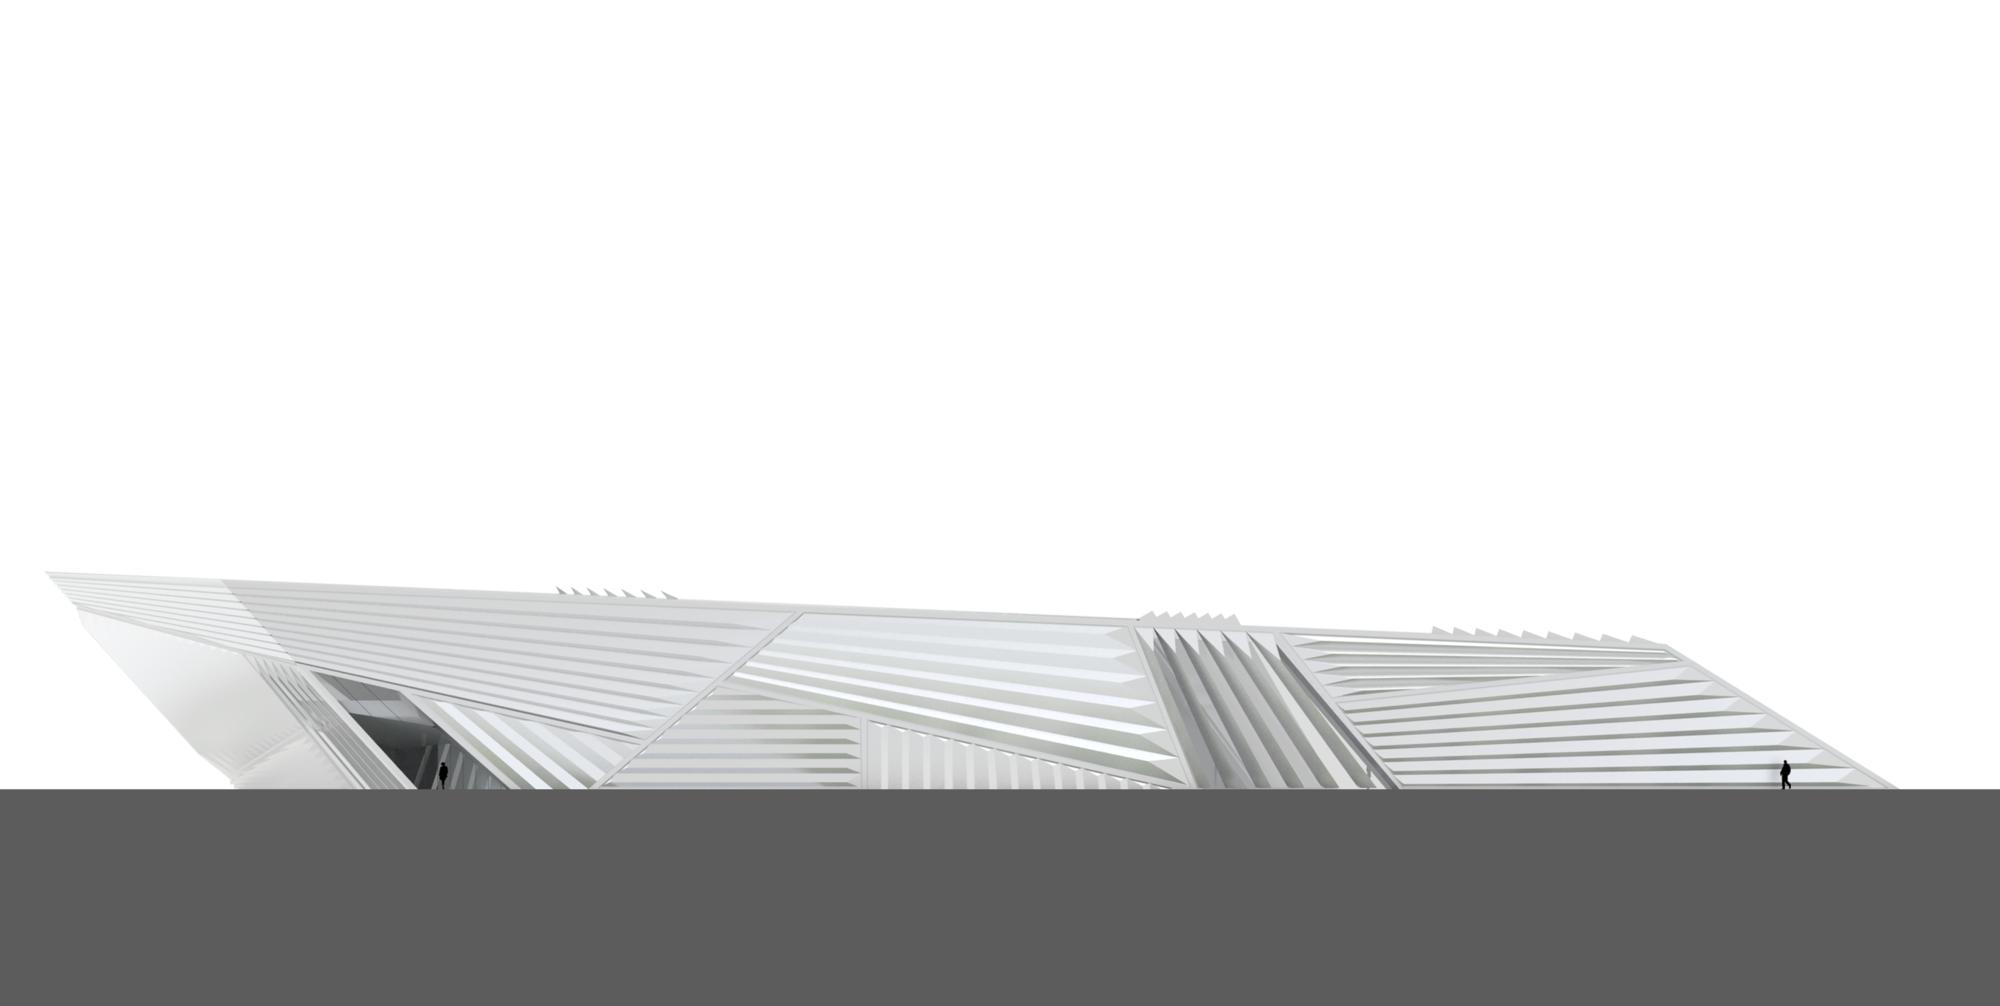 Eli & Edythe Broad Art Museum / Zaha Hadid Architects